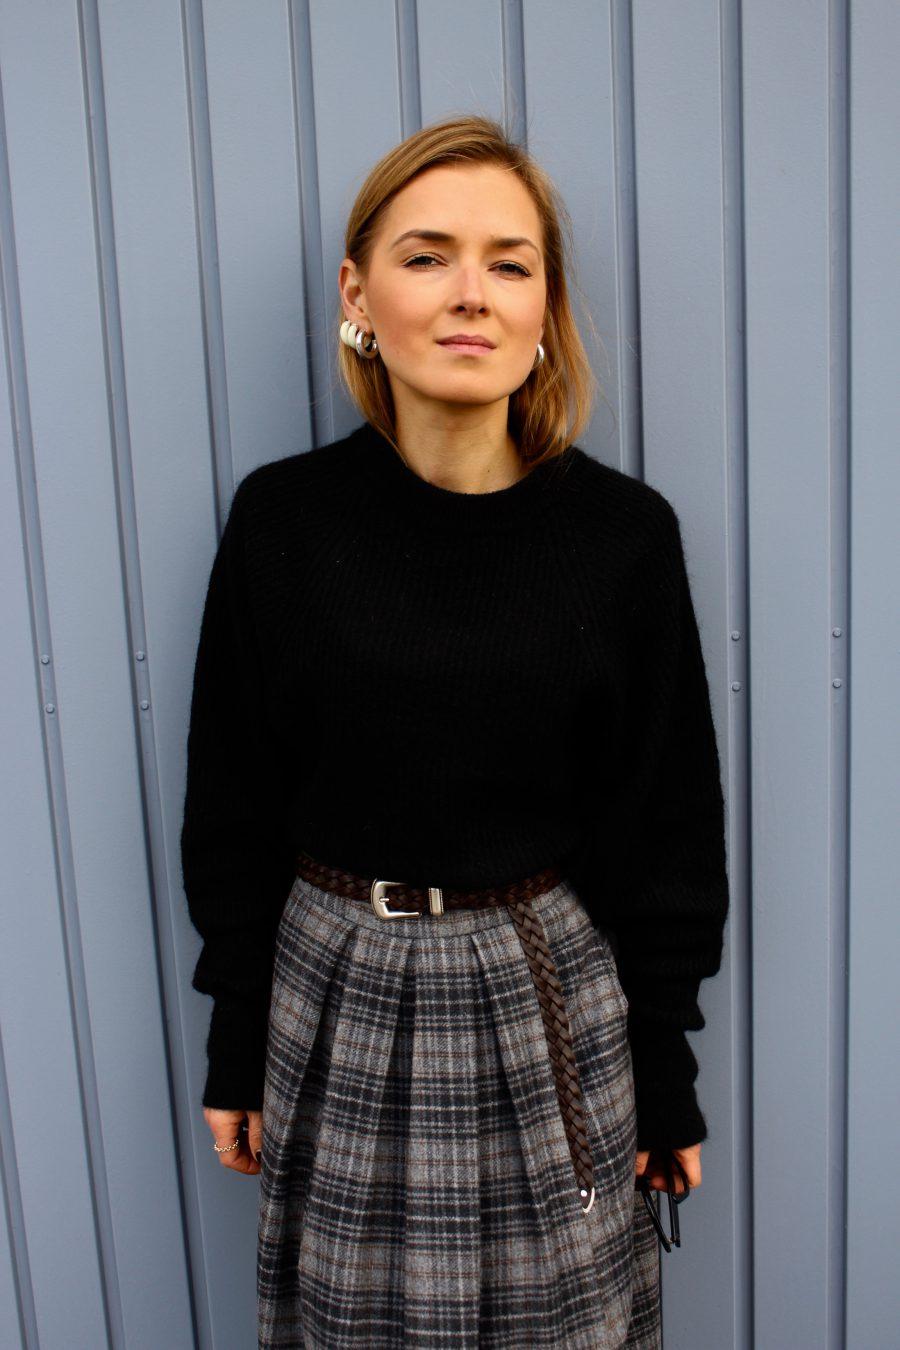 Black sweater blogger style winter 2018 look